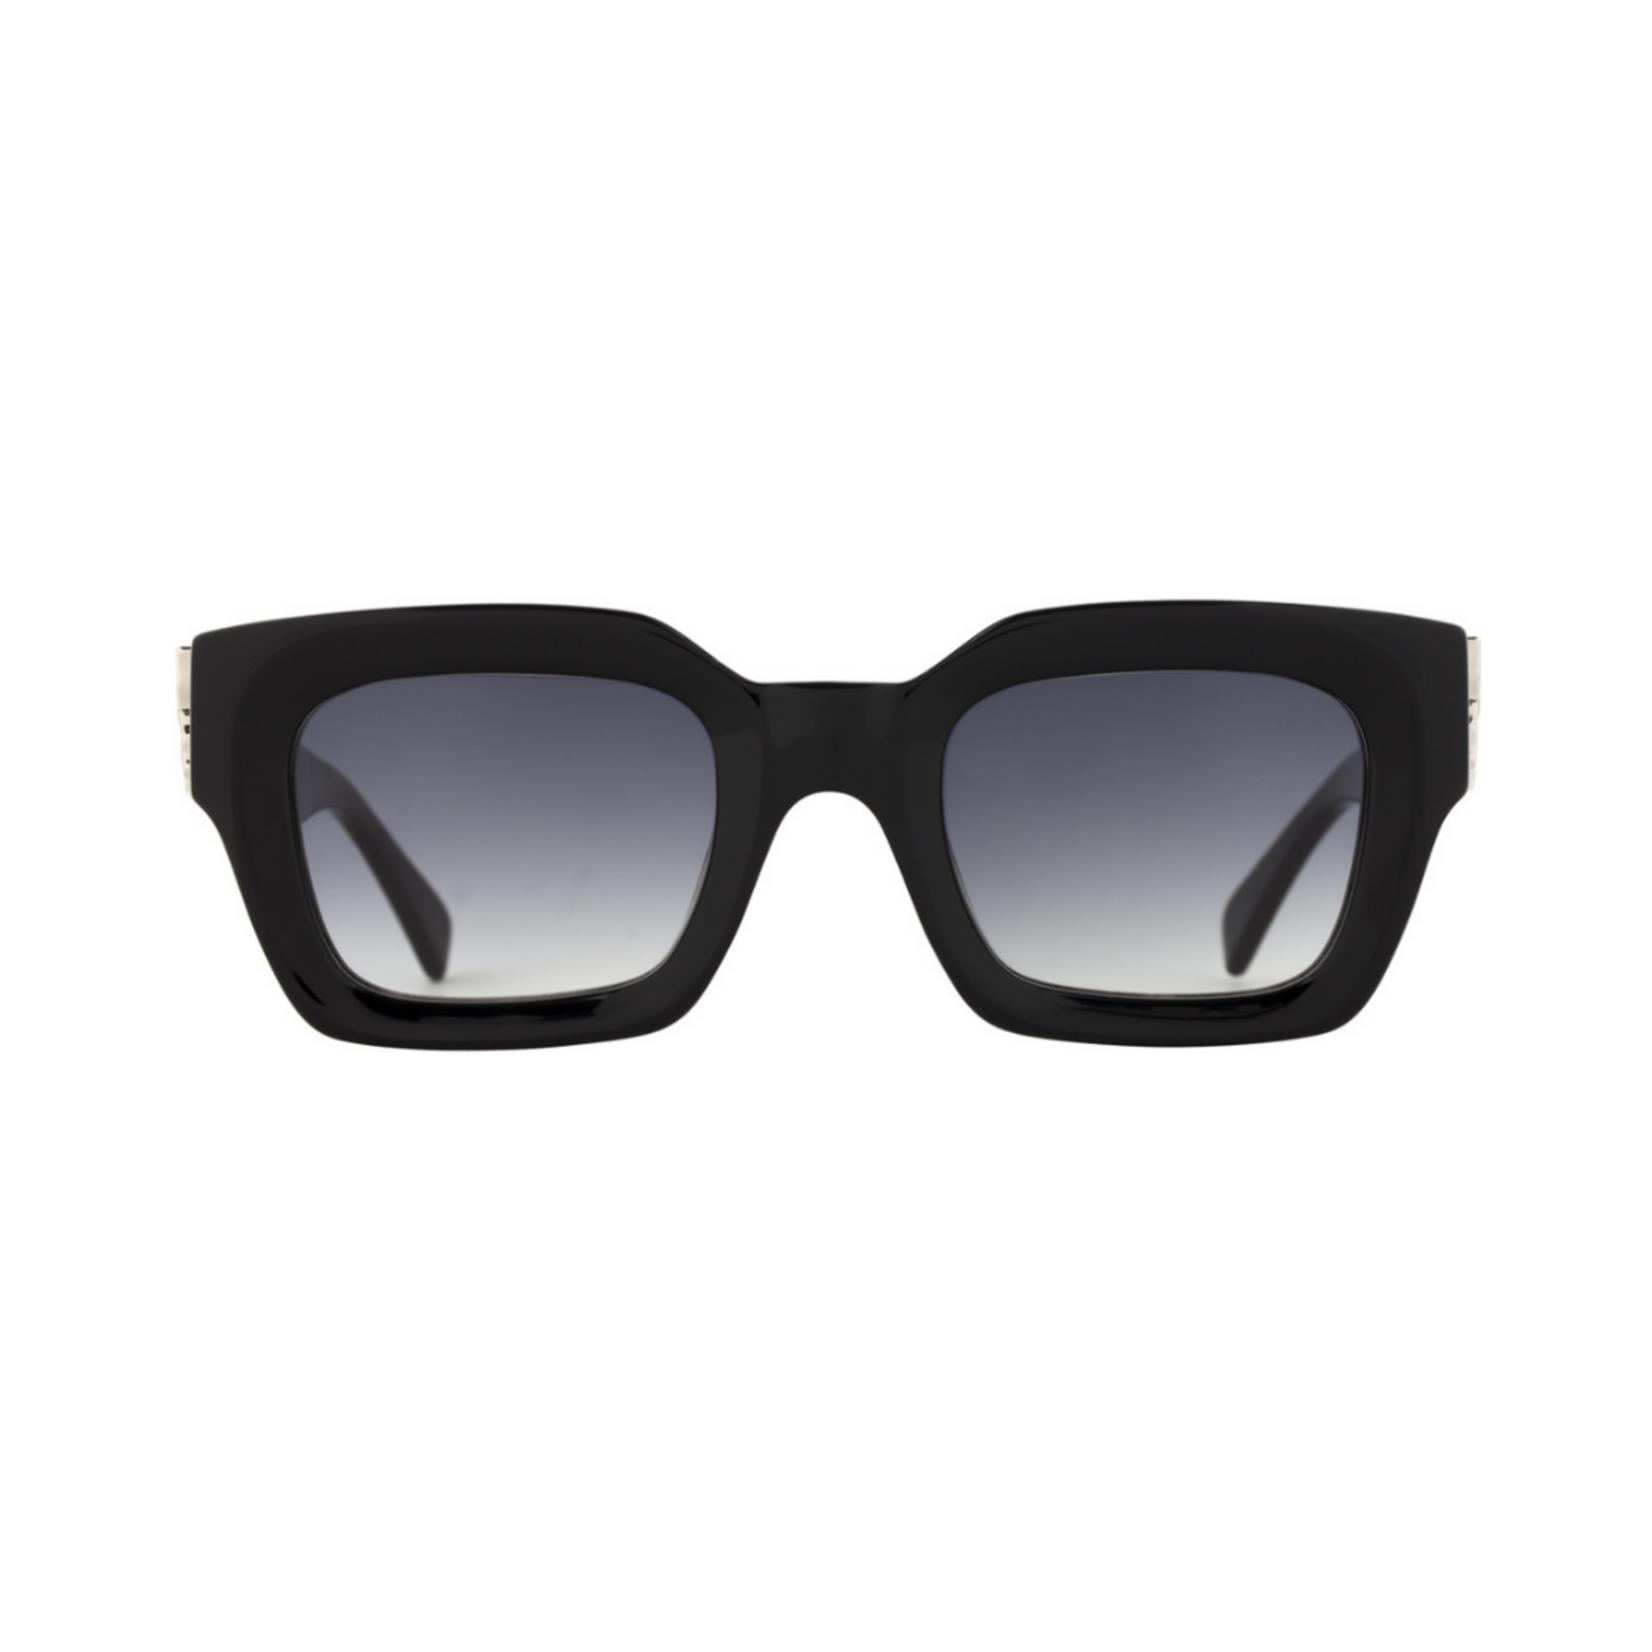 Amber Sceats Sofia Sunglasses